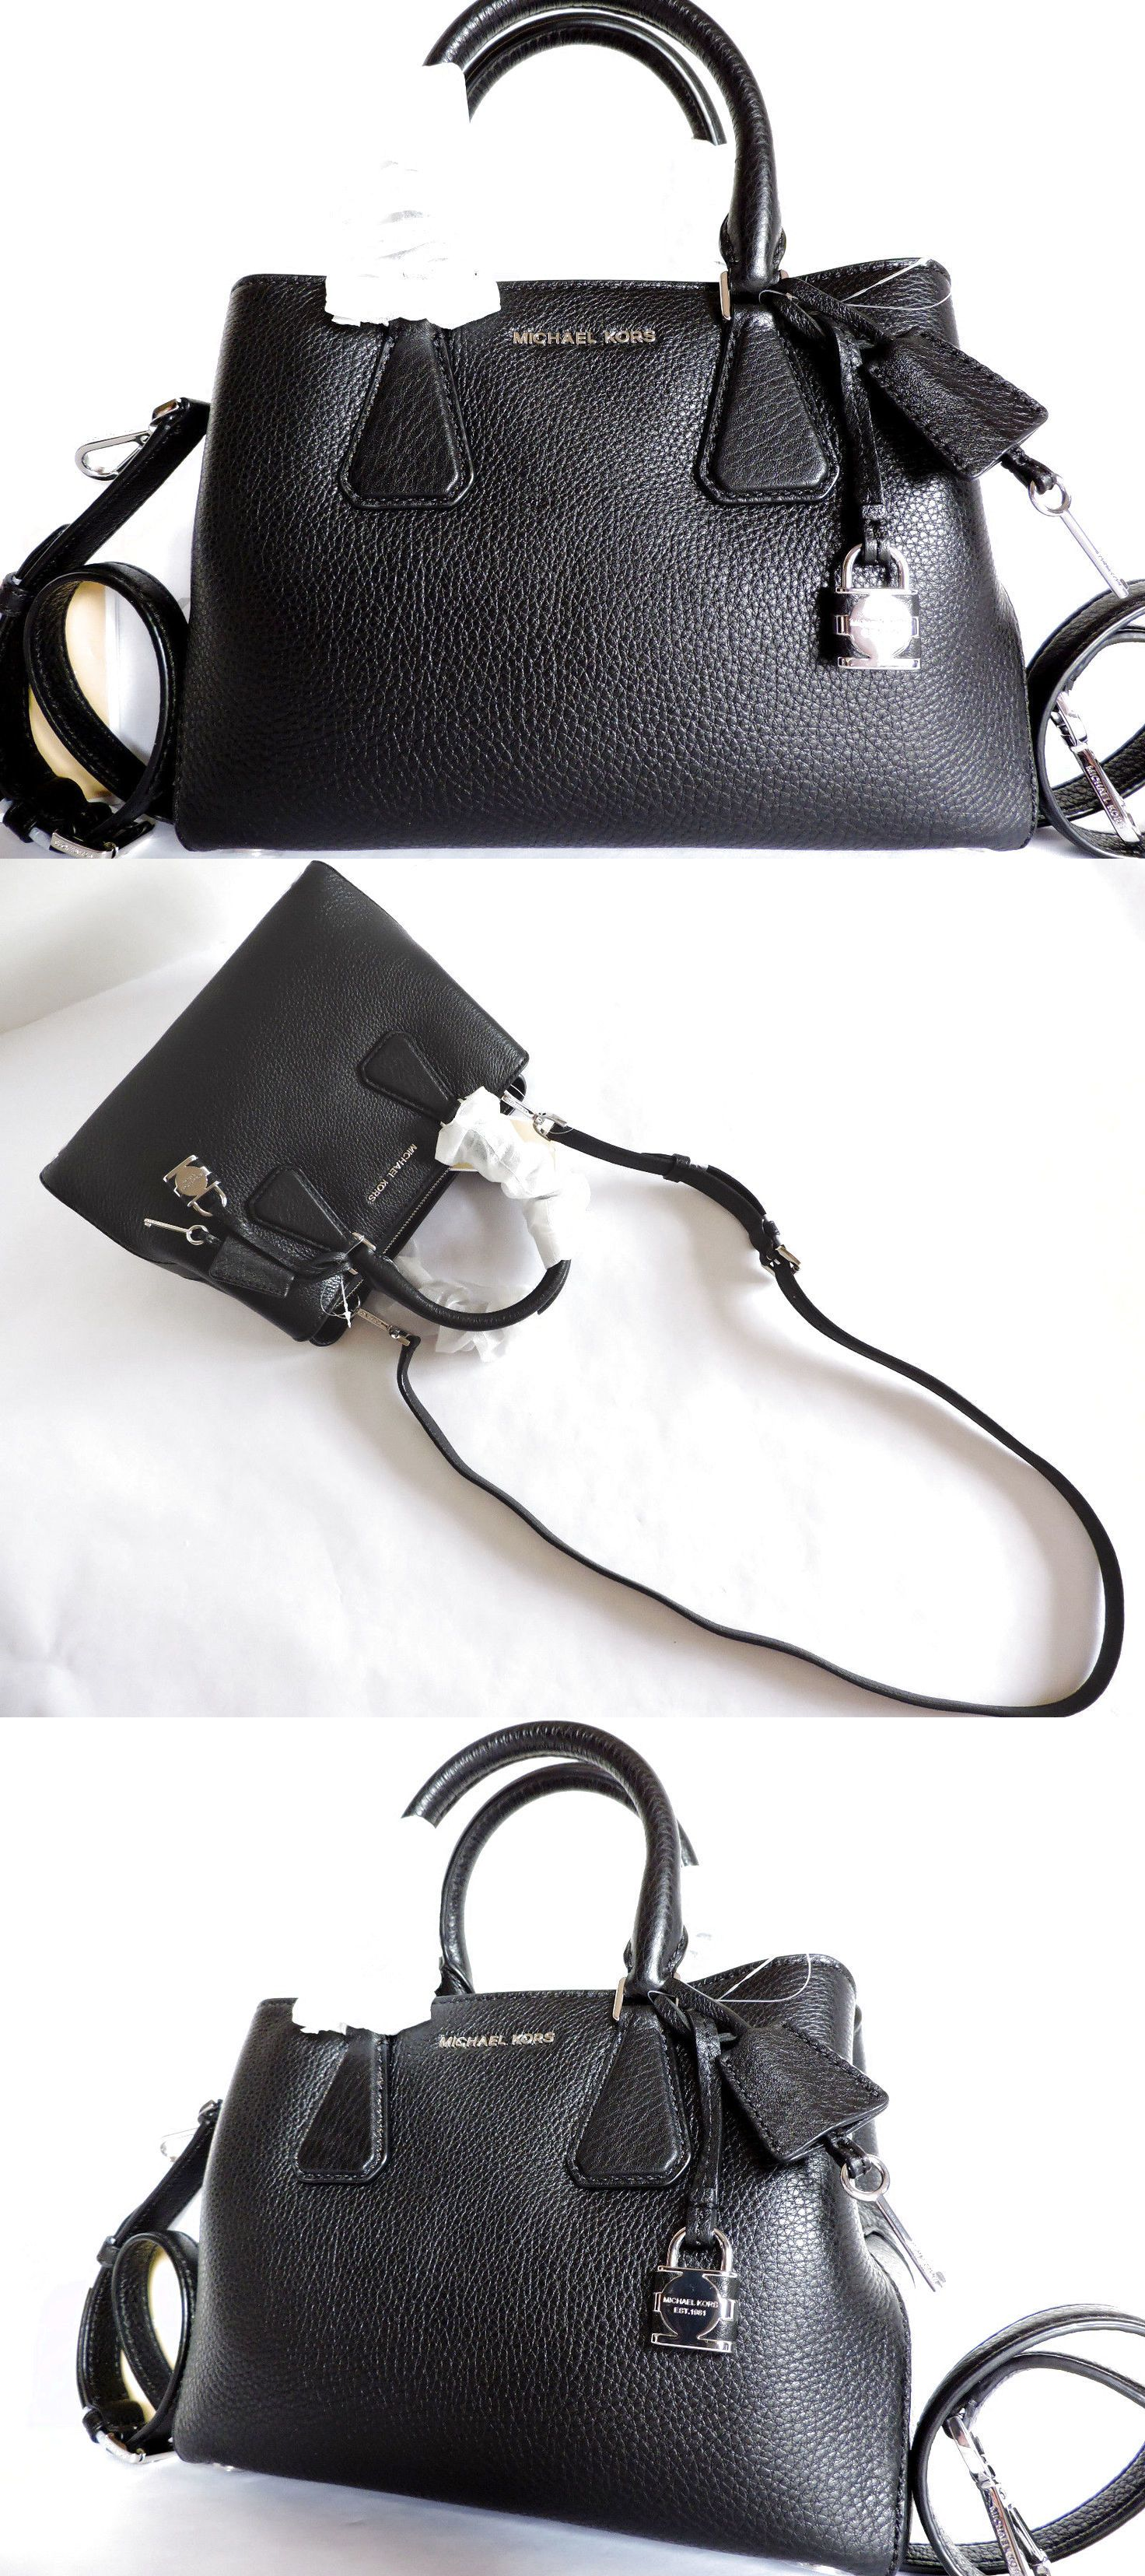 07c8807e774c Michael Kors Camille Black Pebbled Leather Small Satchel Bag NWT $229.0